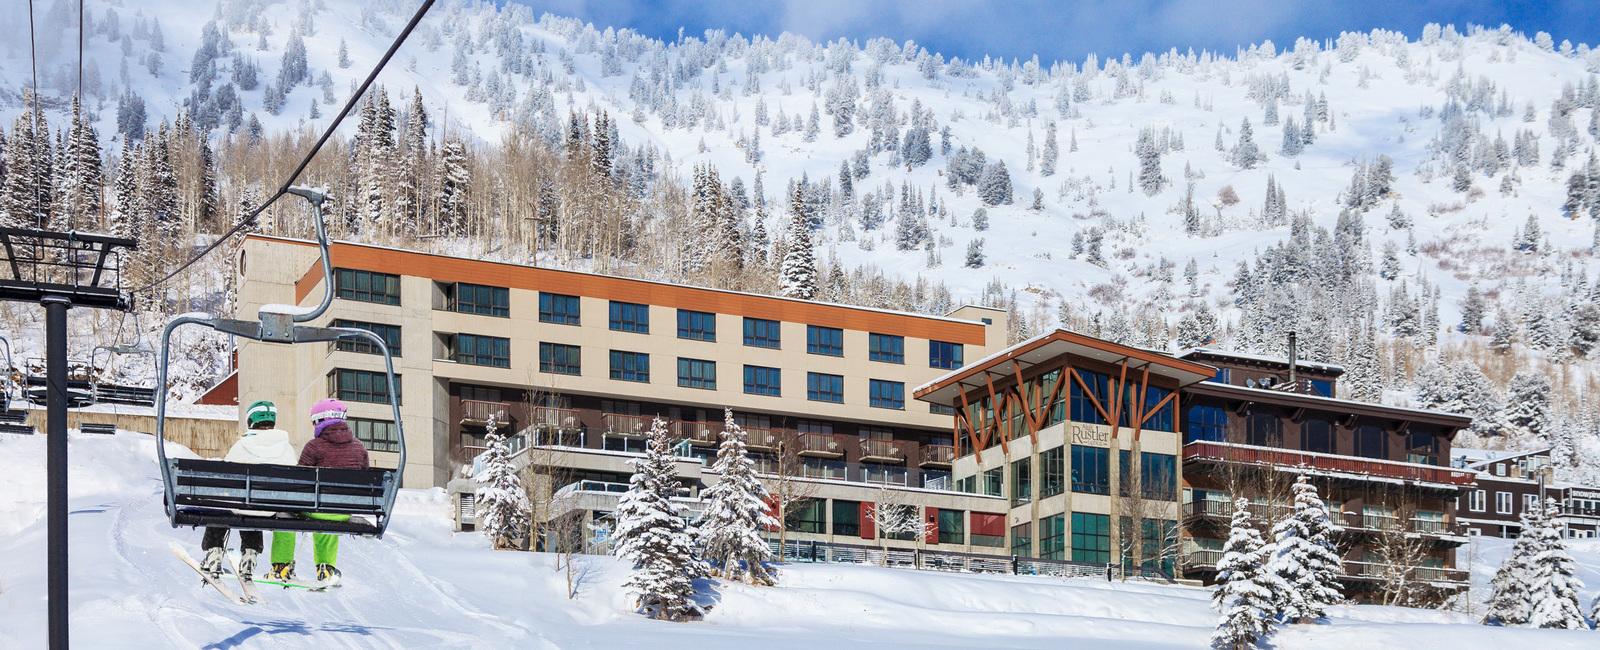 Alta's Rustler Lodge